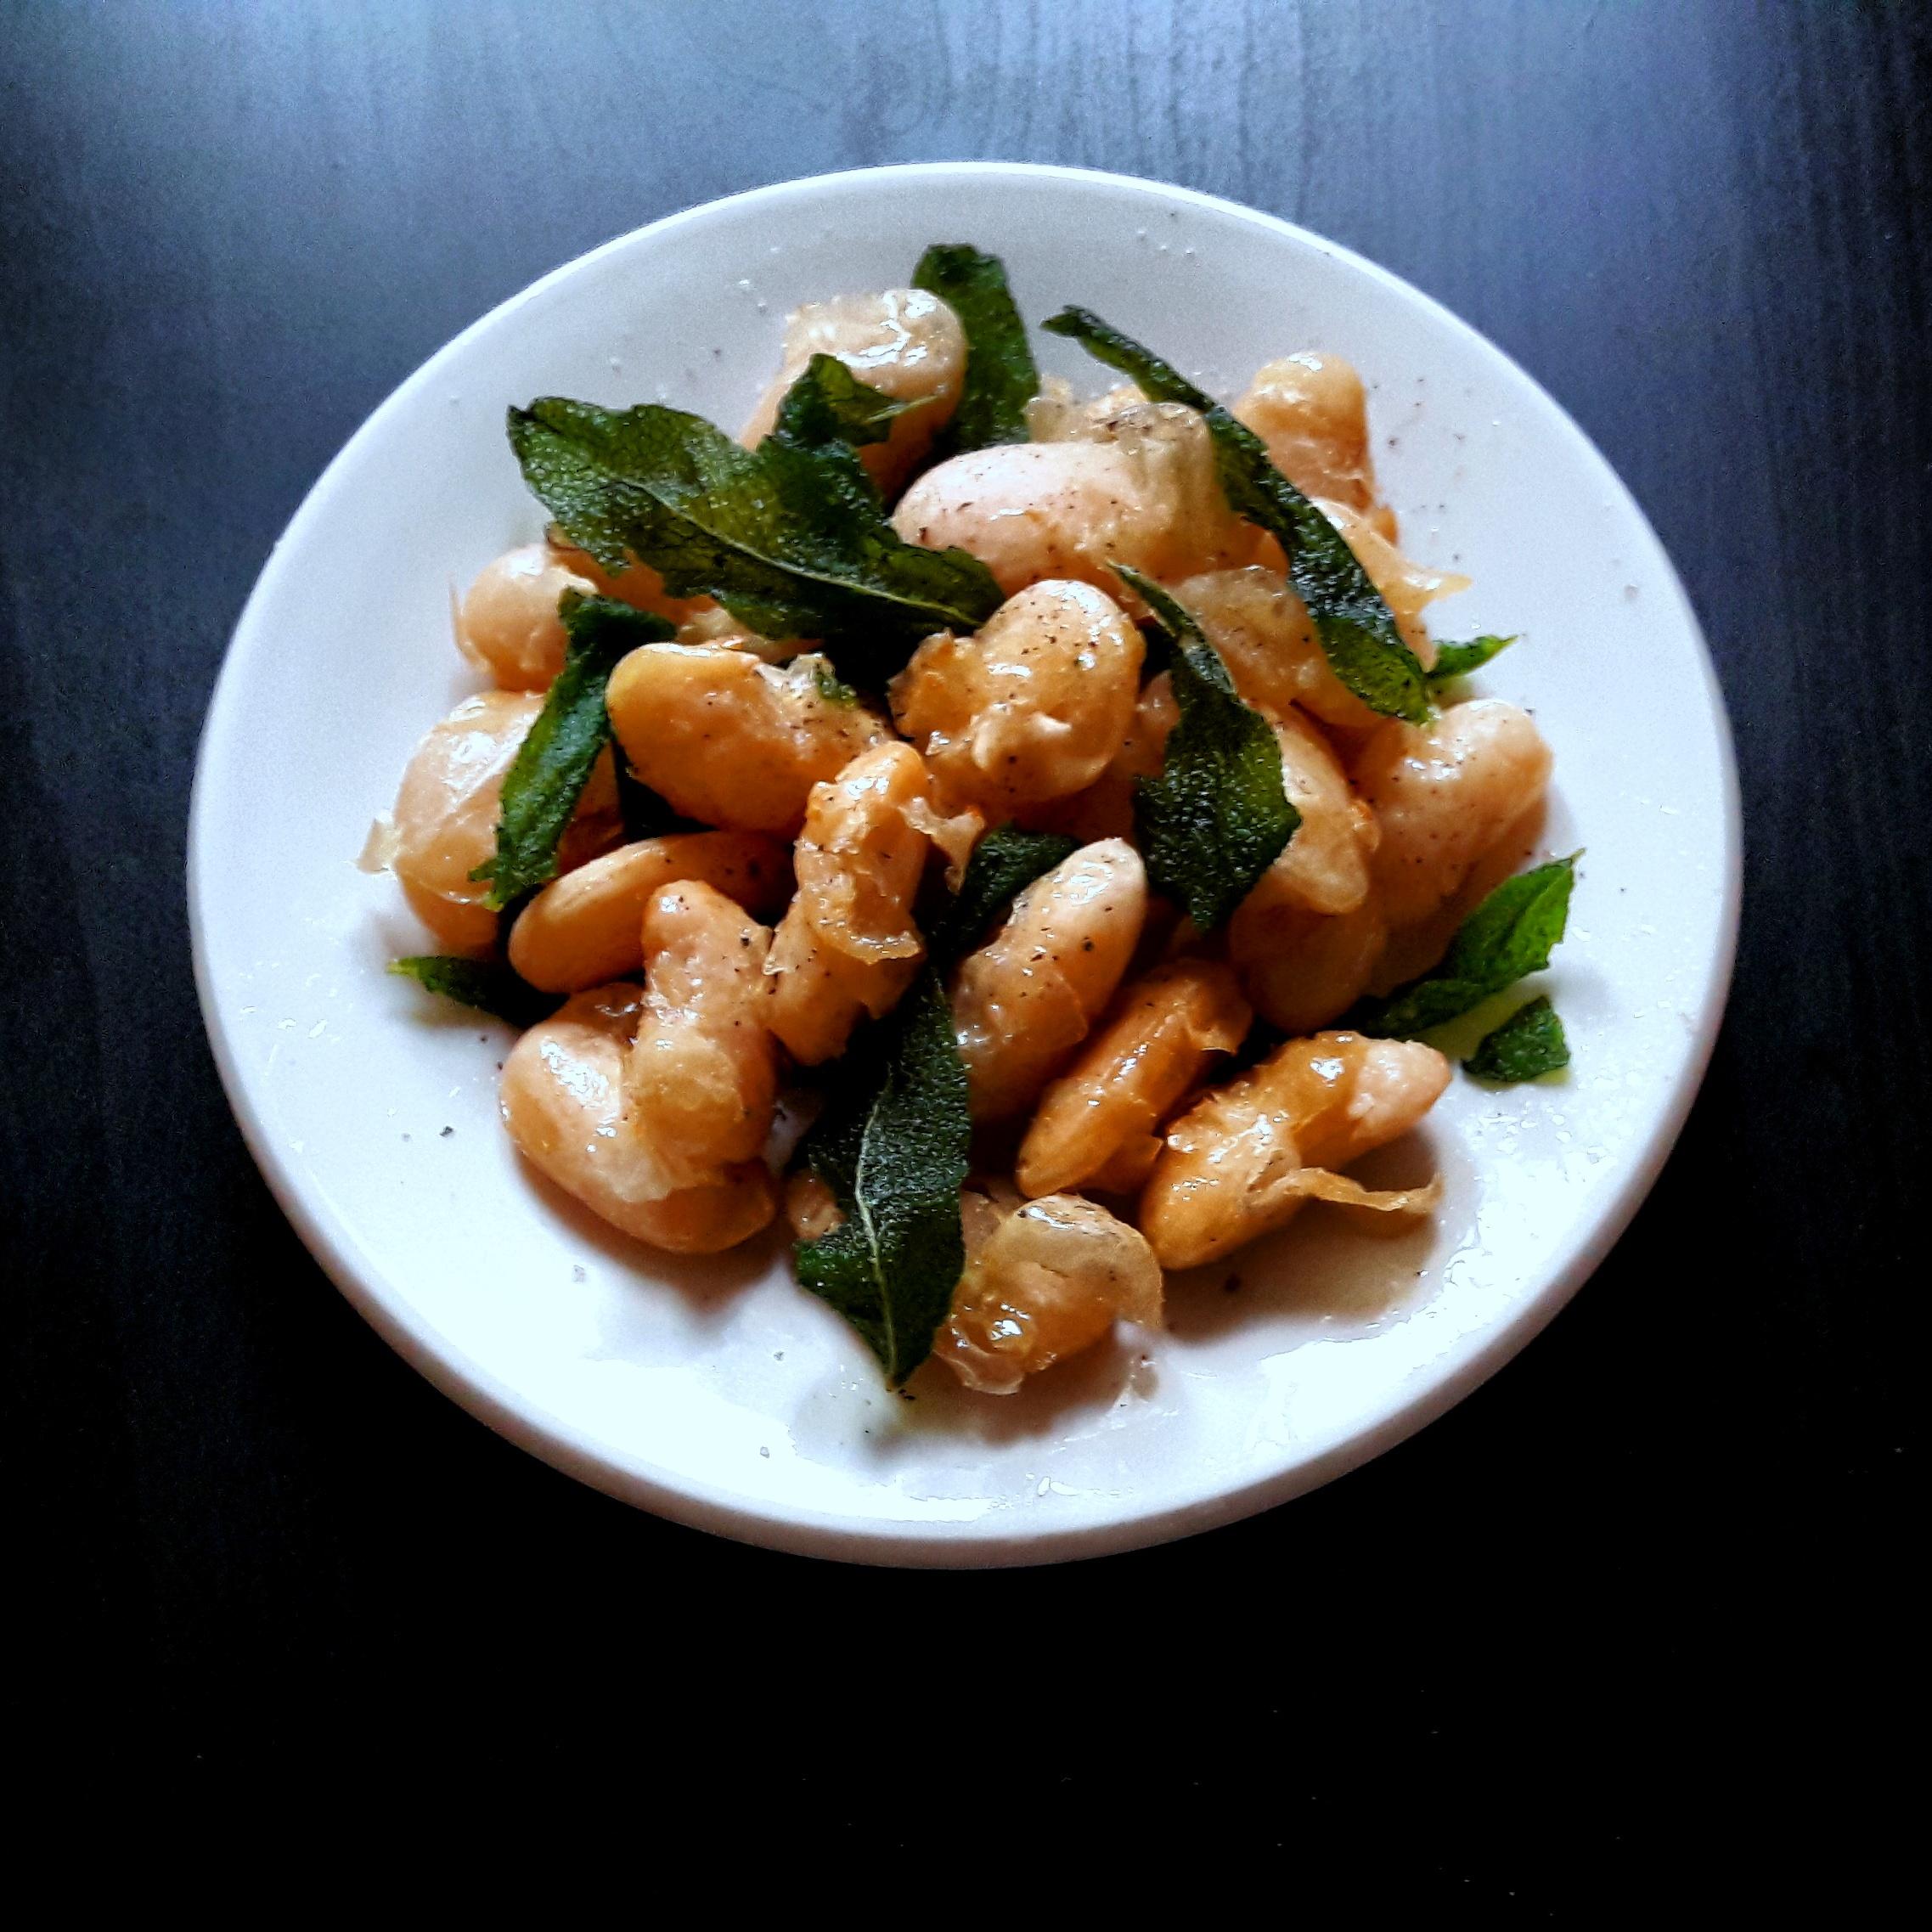 fasses huîtres et glaçons